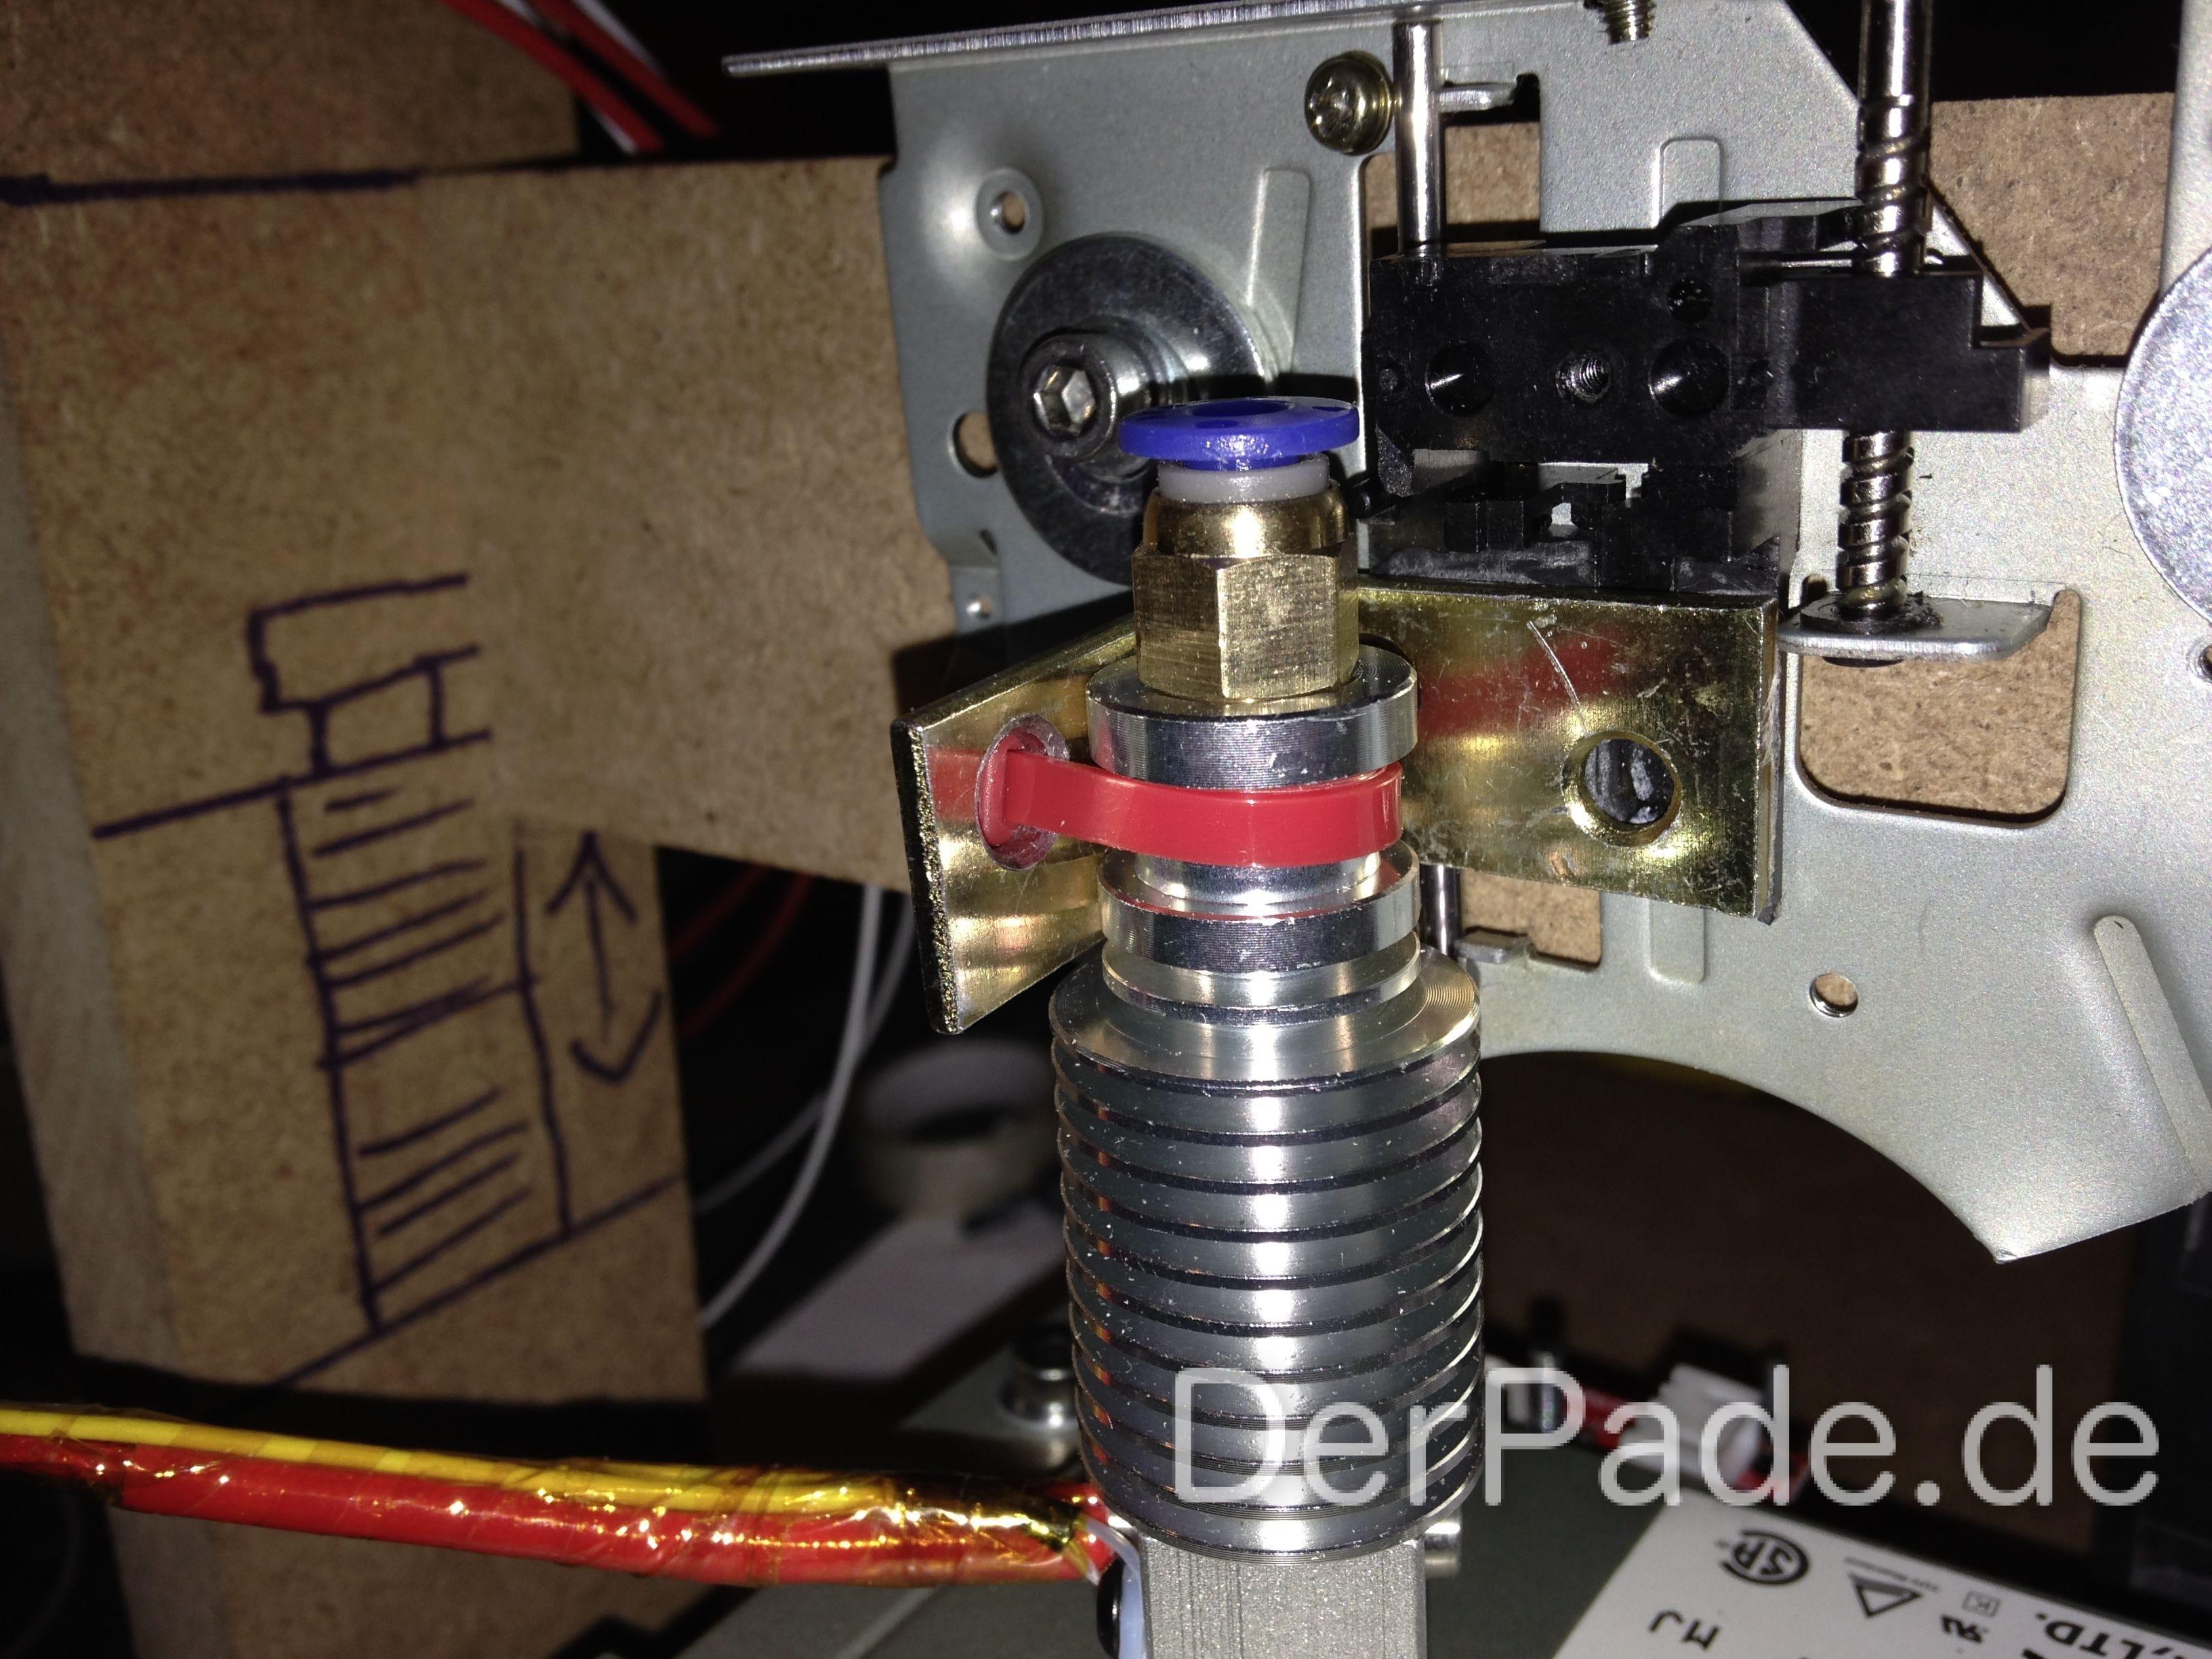 Tutorial 3D Drucker Teil 5: Hotend anbringen Der Pade image 1